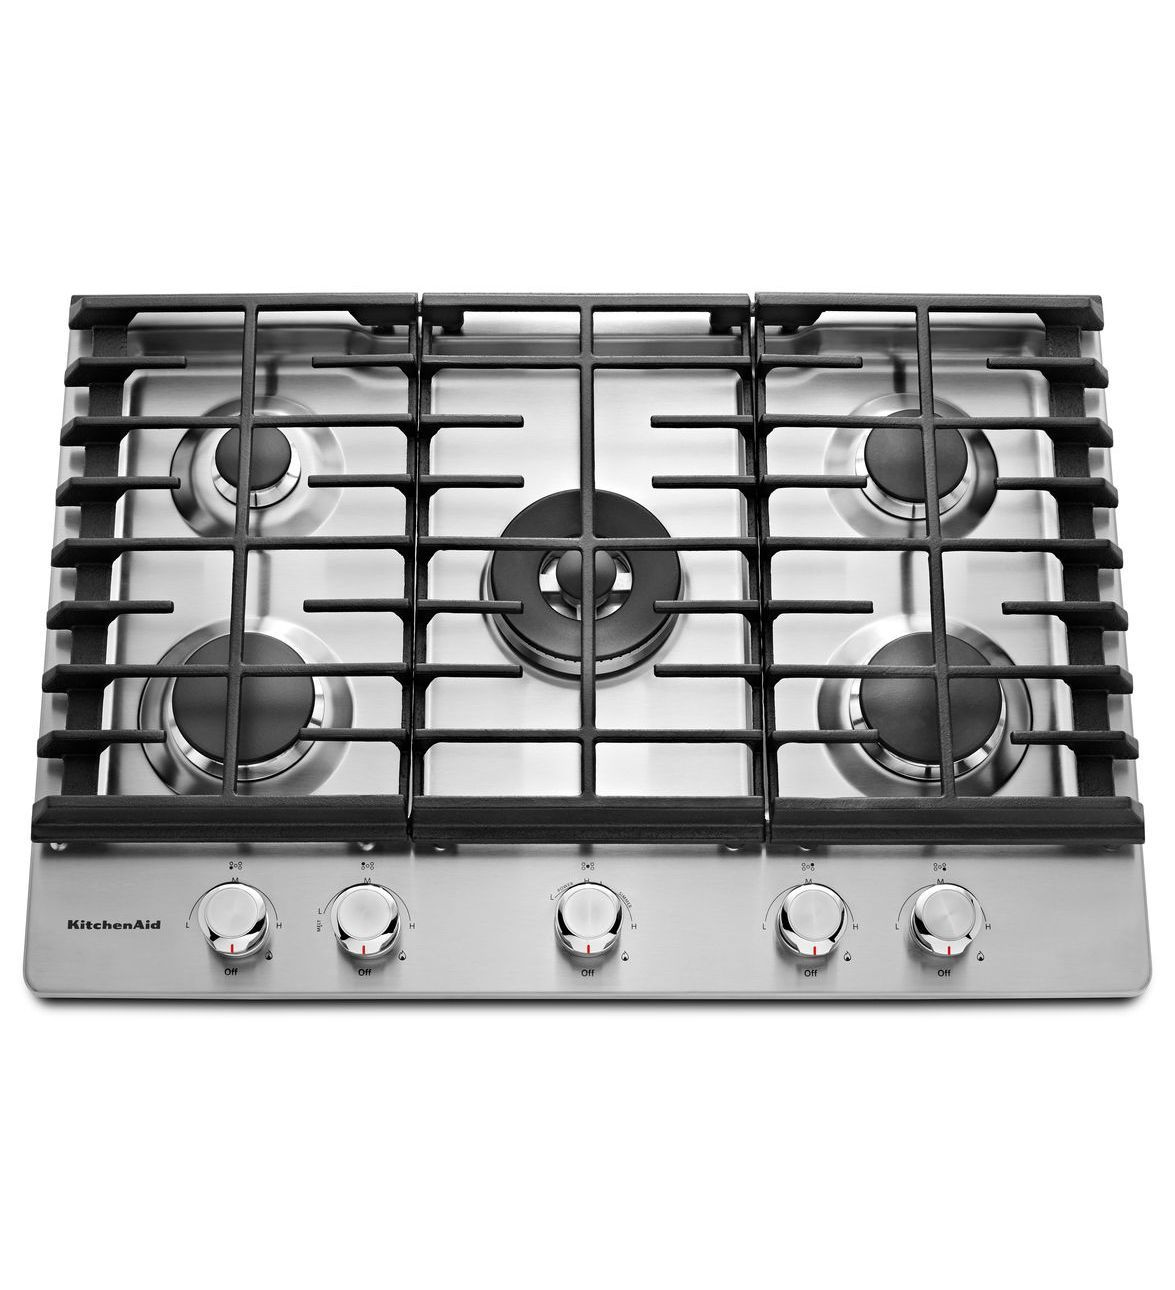 Stainless Steel 30 5 Burner Gas Cooktop Kcgs550ess Kitchenaid Gas Cooktop Kitchen Aid Cooktop